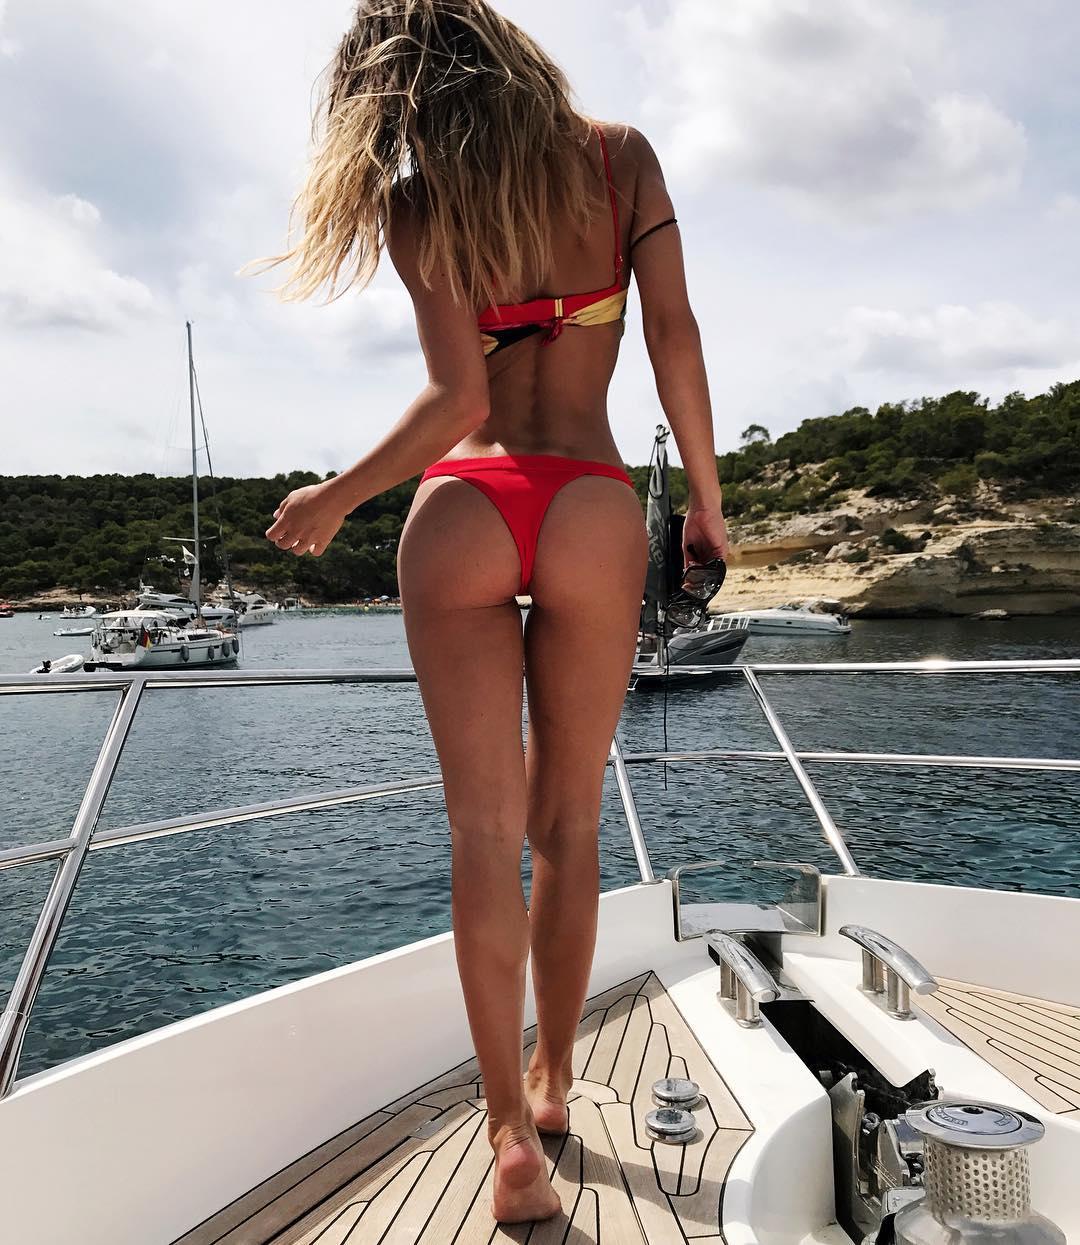 Ann-Kathrin Brömmel Nude Photos and Videos | #TheFappening